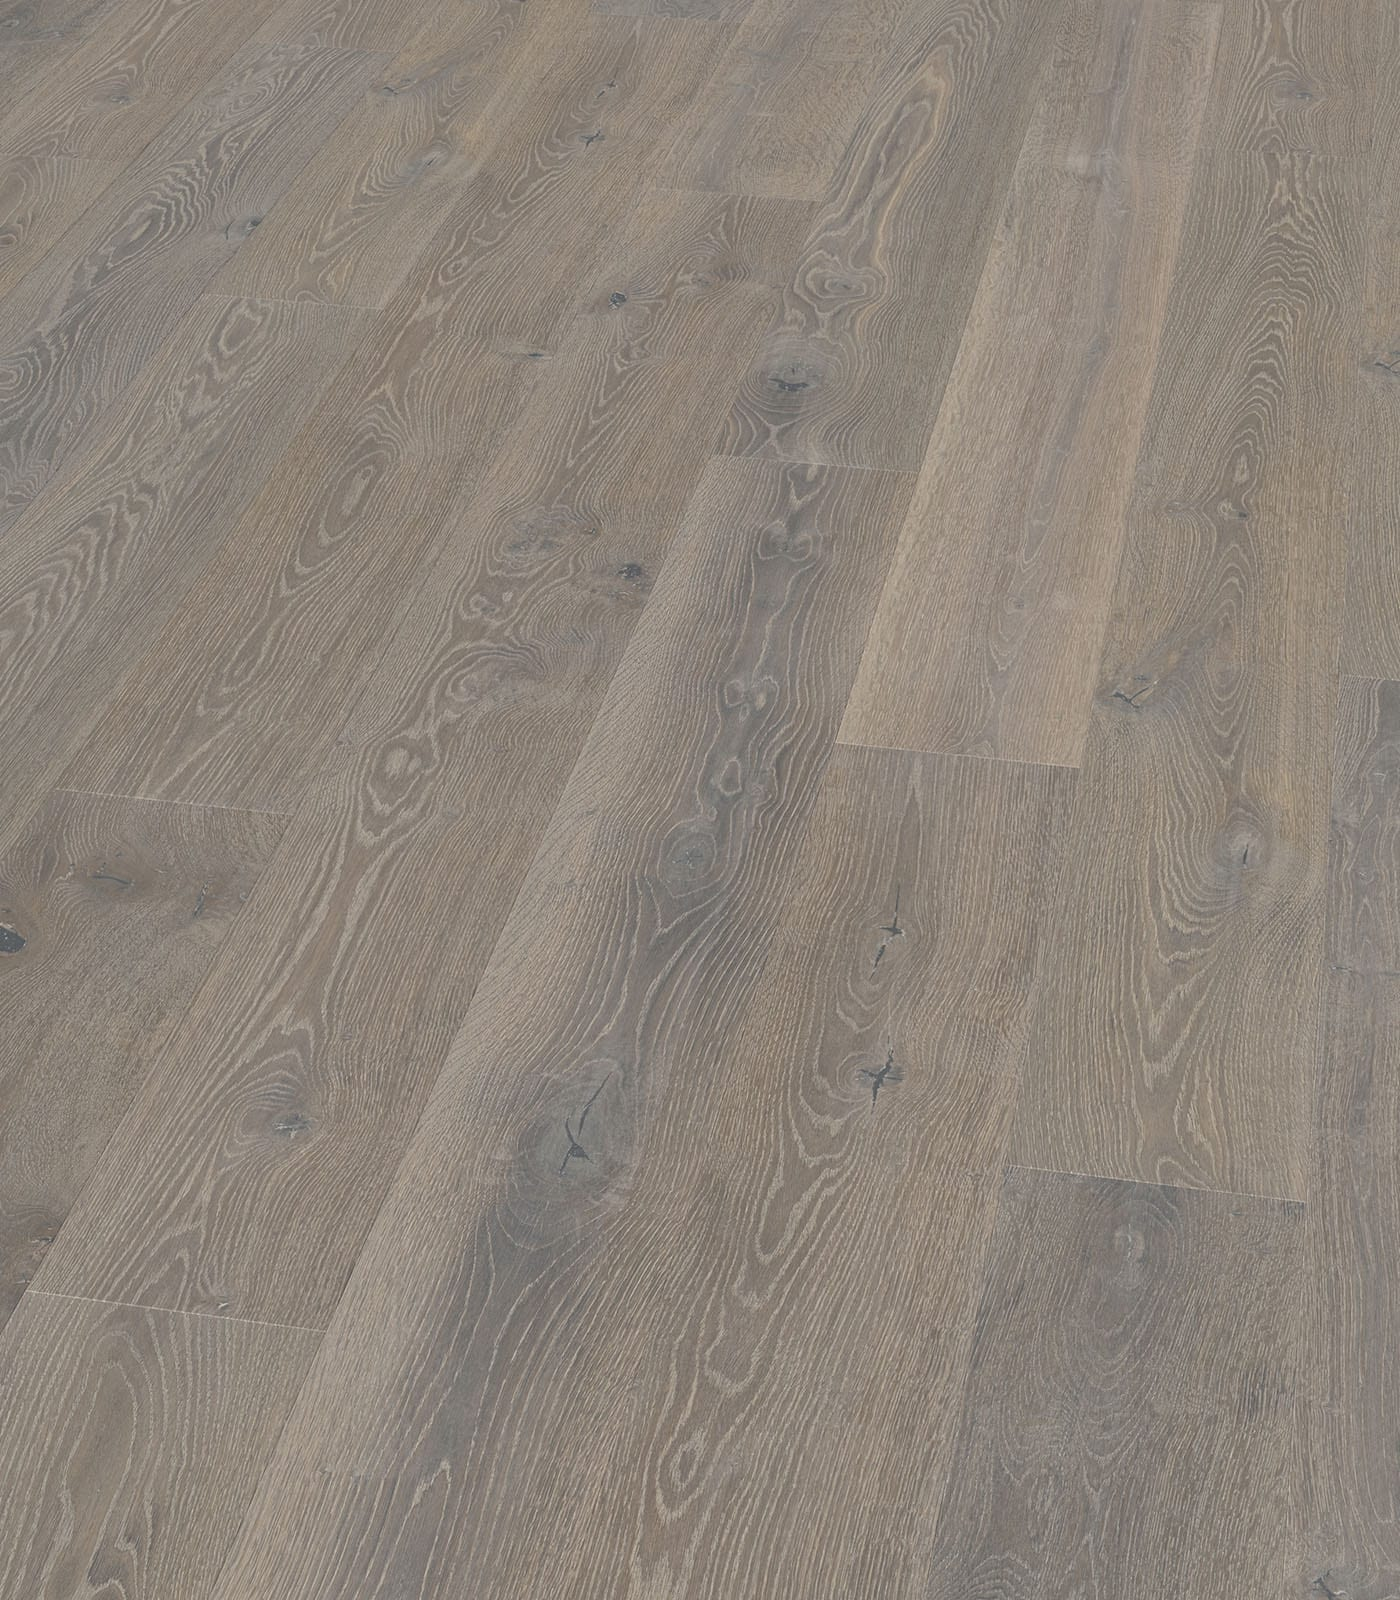 Goa-LIfestyle Collection-European Oak Floors-angle